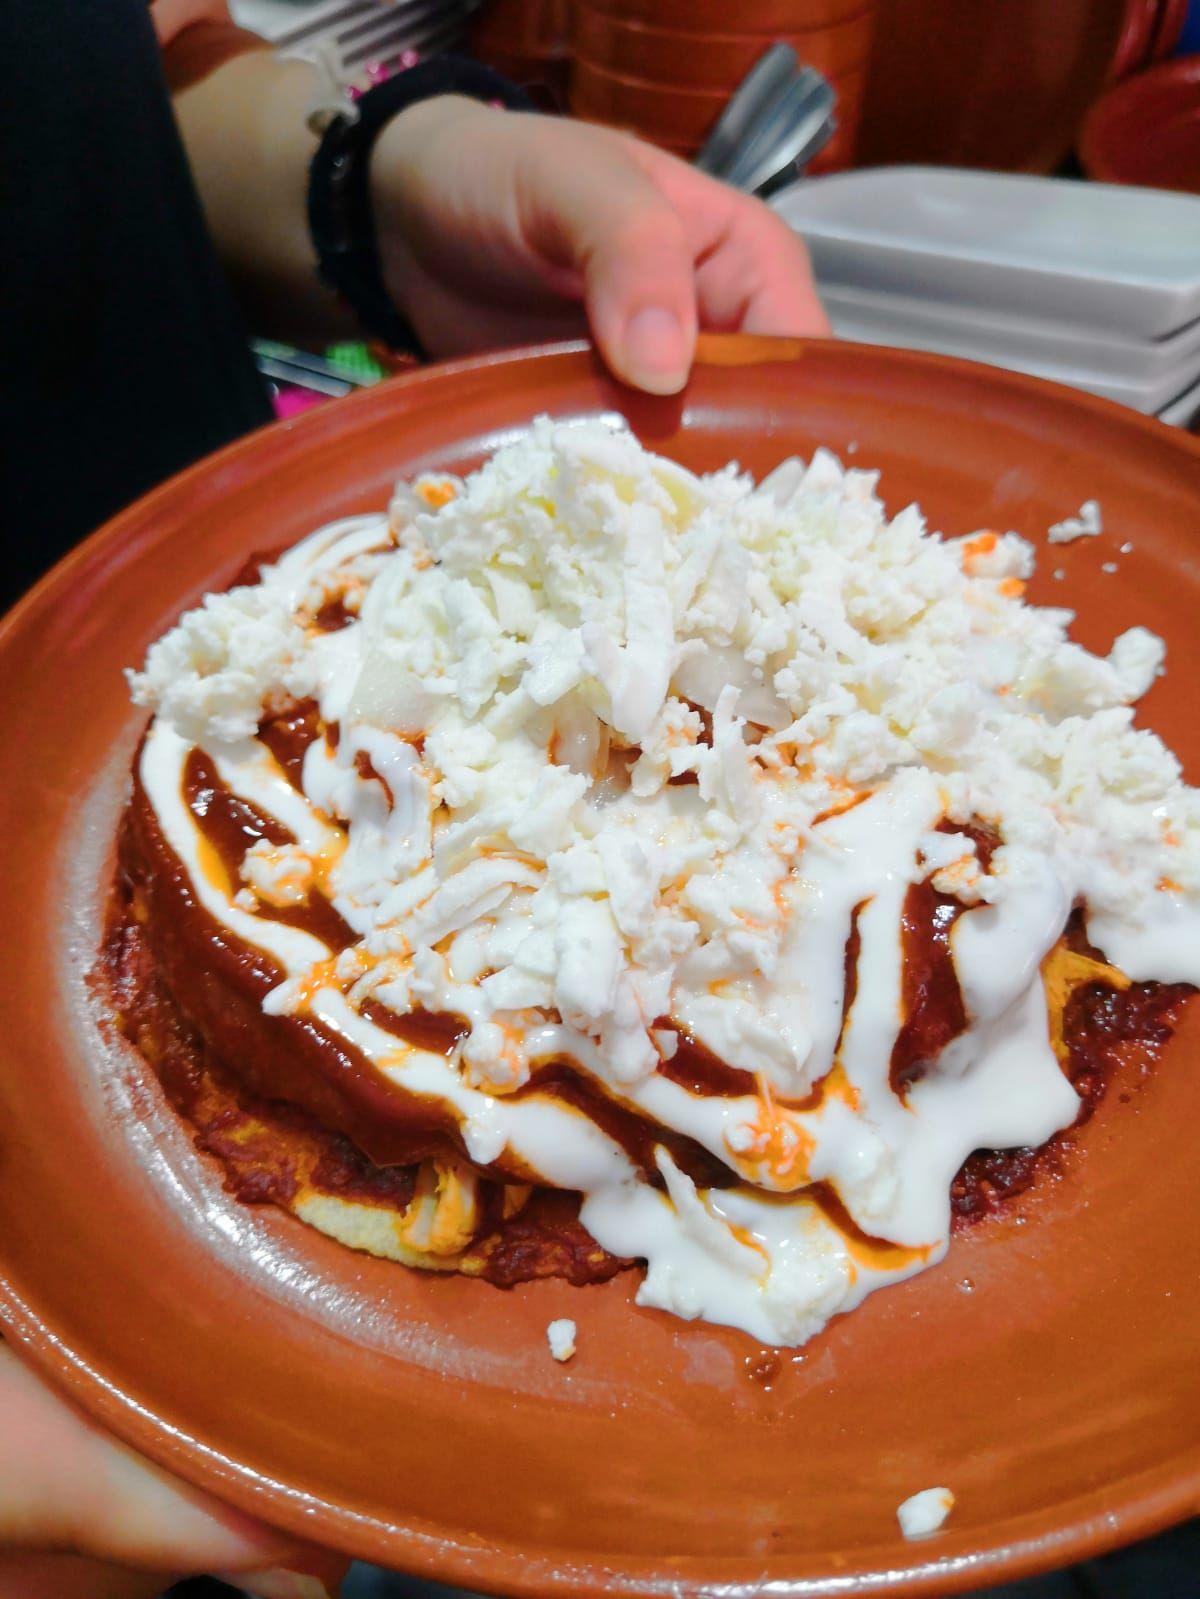 Foto 11 de Restaurante mexicano en  | Cantina La Catrina